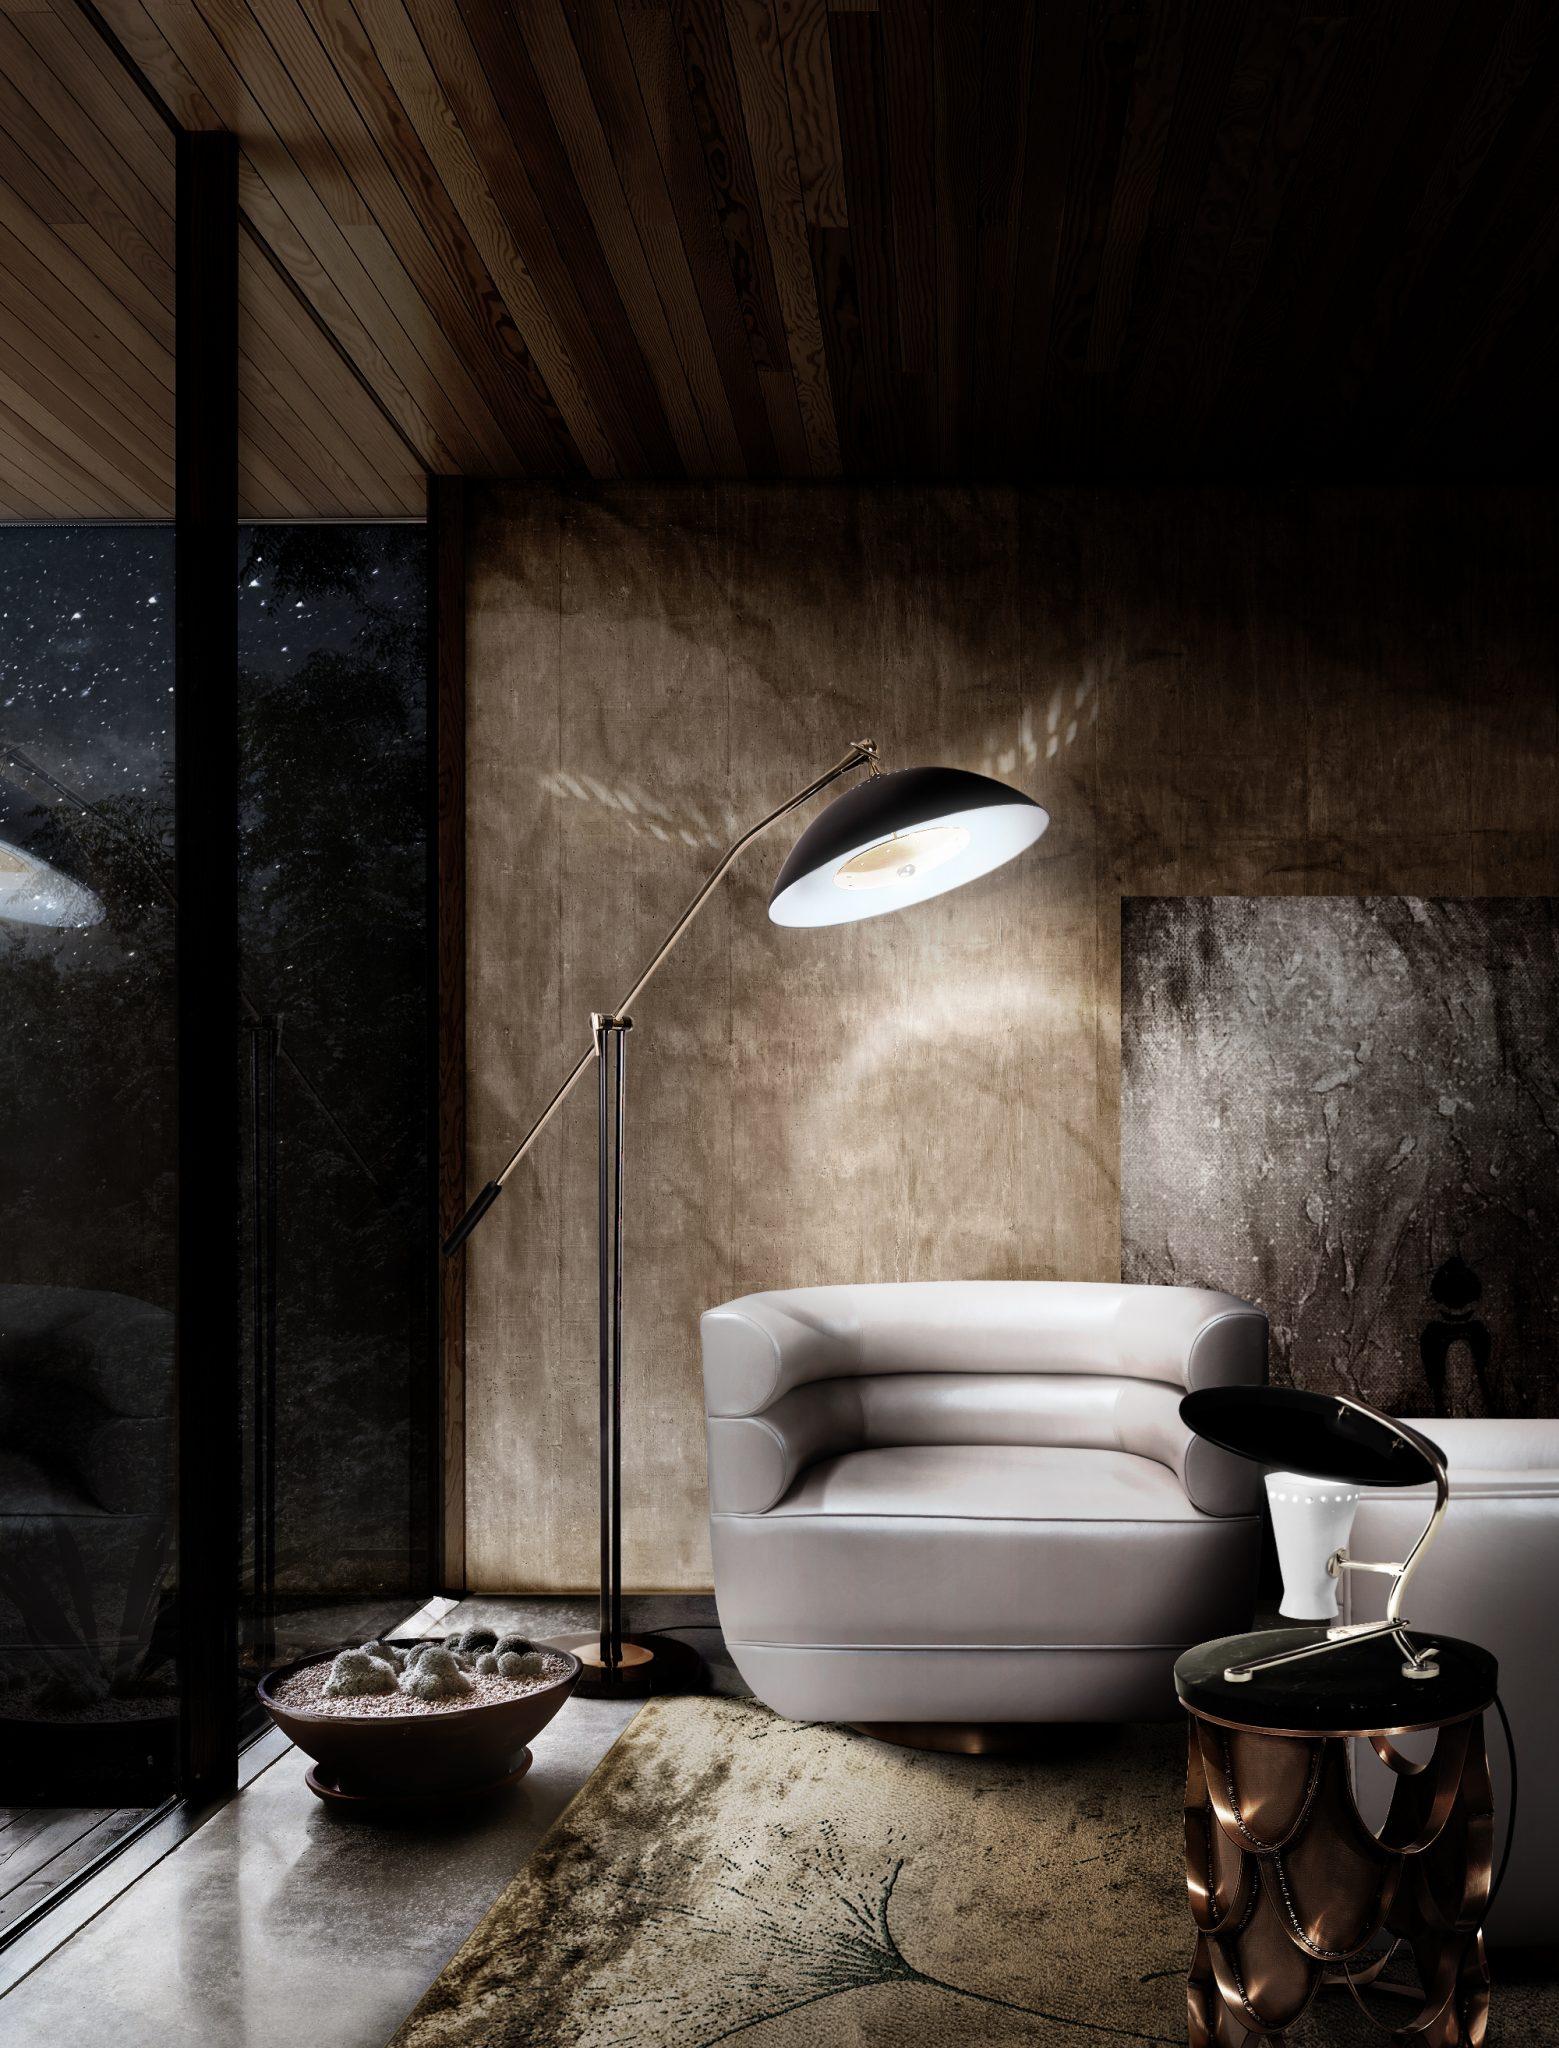 WELL-LIT LIVING ROOM CORNER AT NIGHT